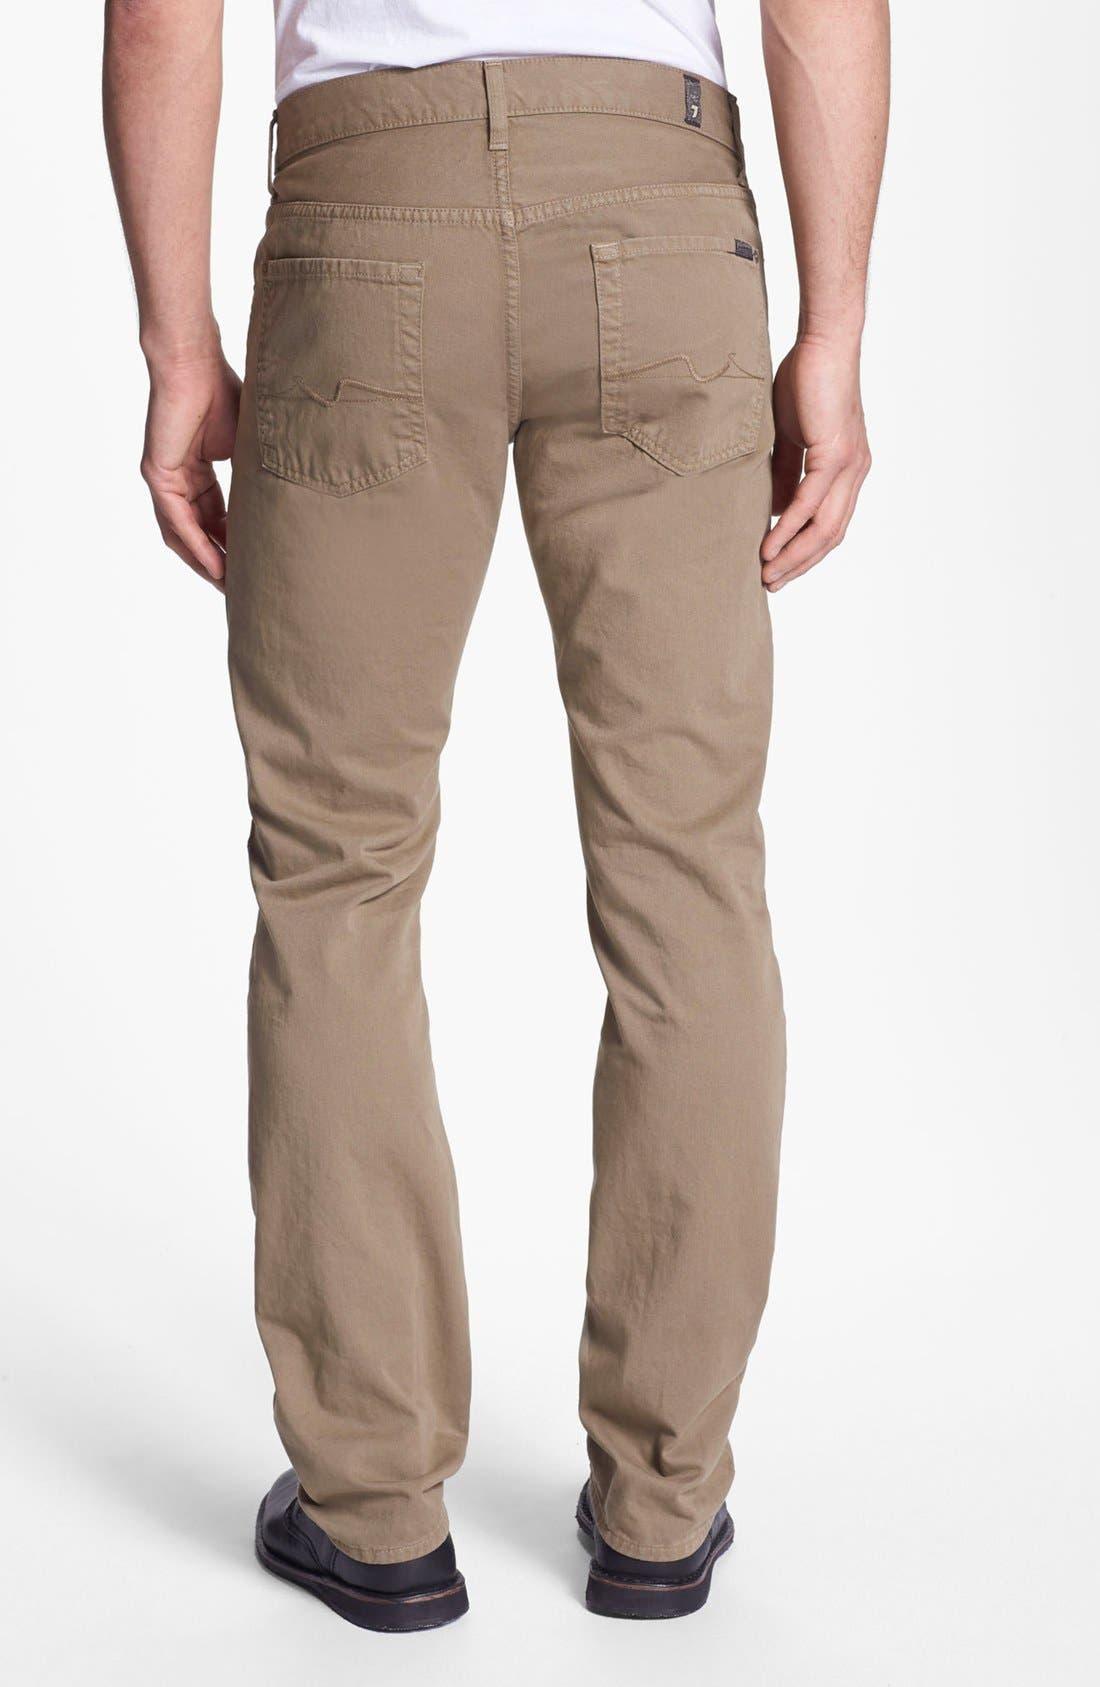 Alternate Image 1 Selected - 7 For All Mankind® 'Slimmy' Slim Fit Jeans (Dark Khaki)